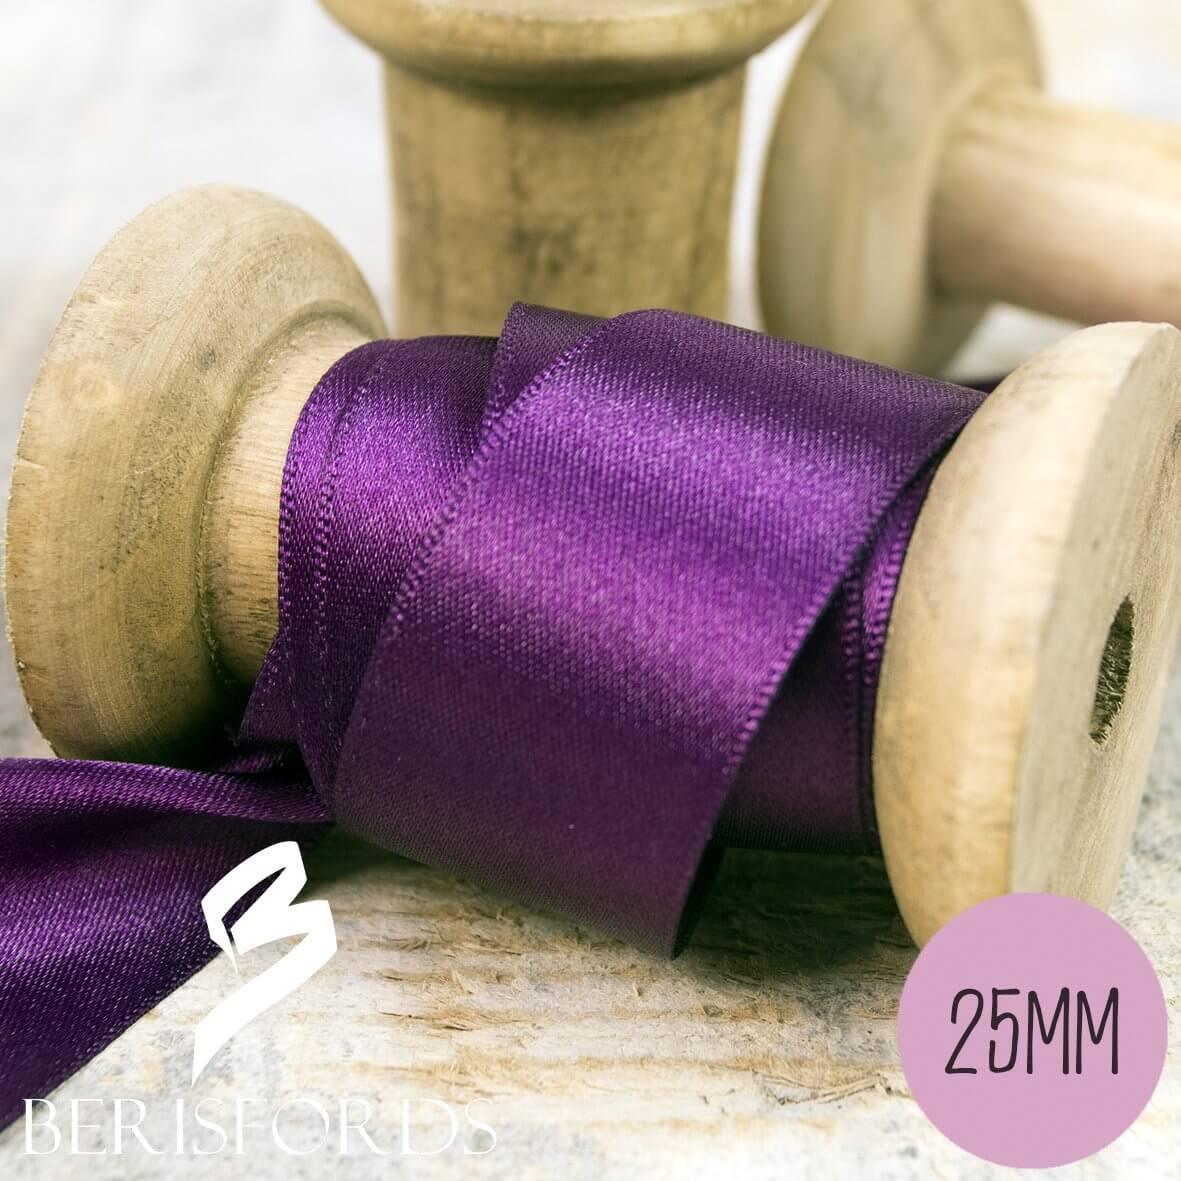 Berisfords Satin Ribbon 25mm